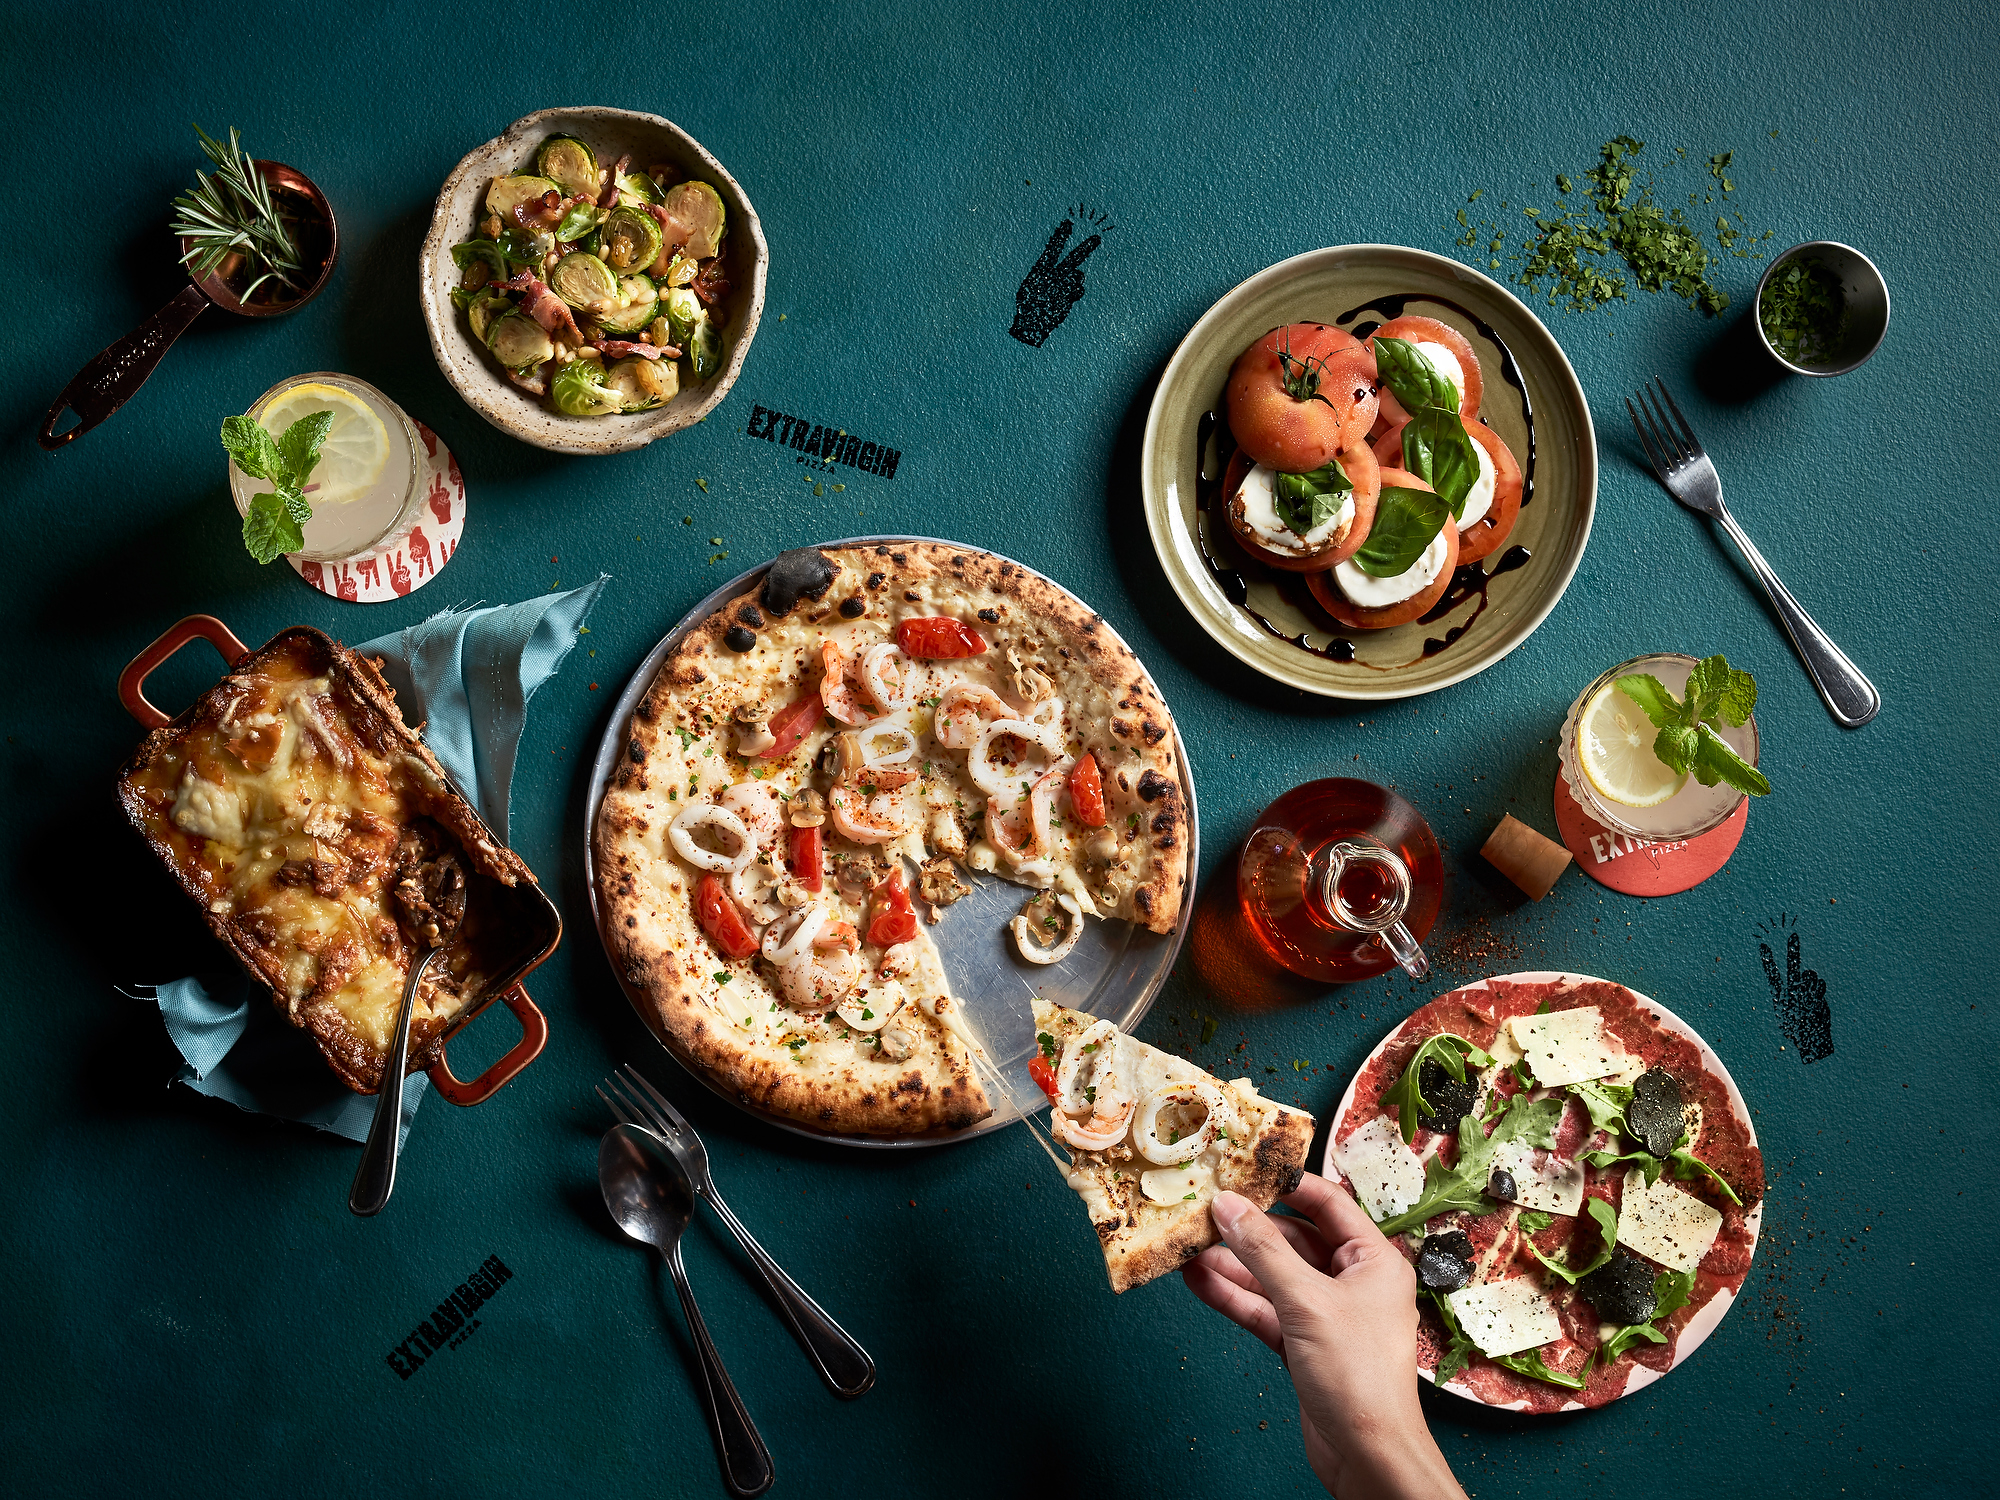 Extra Virgin Pizza, self-proclaimed Singapore's Best Neapolitan Pizza